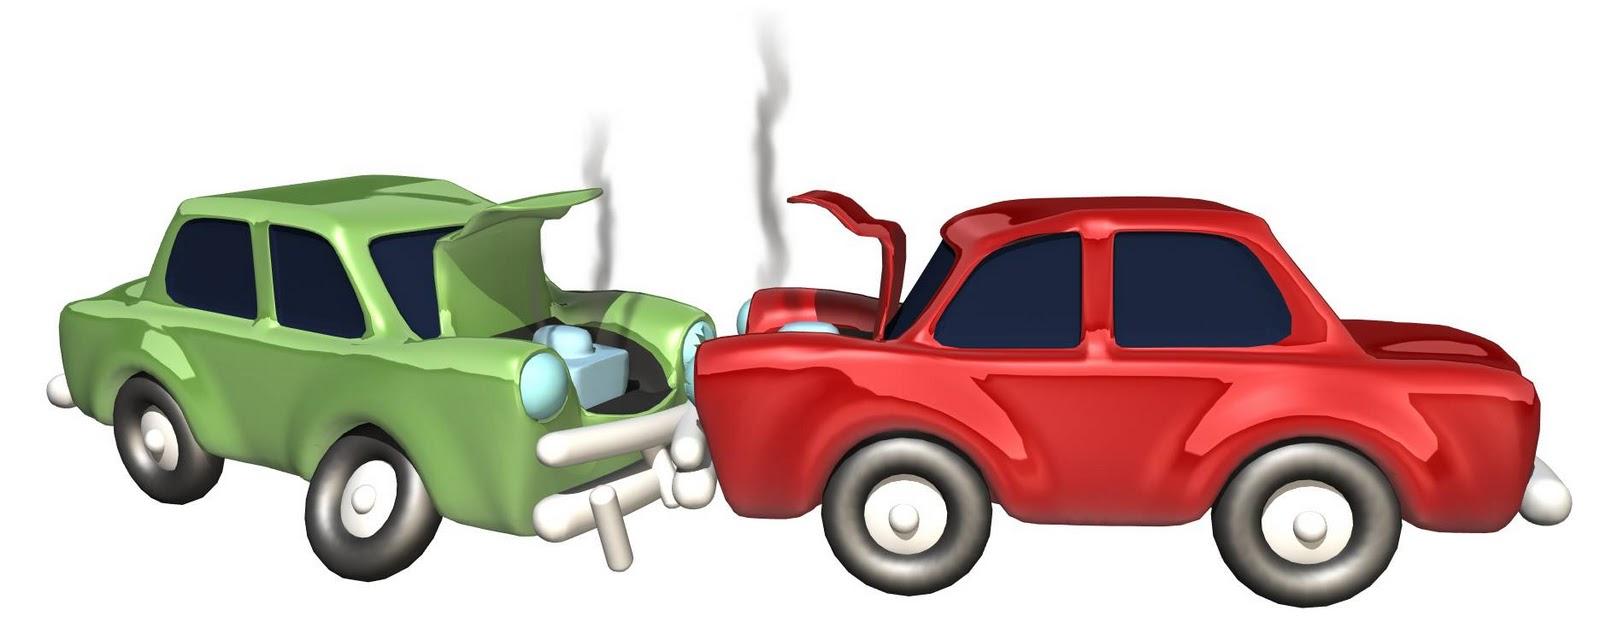 I Crashed My Car What Do I Do